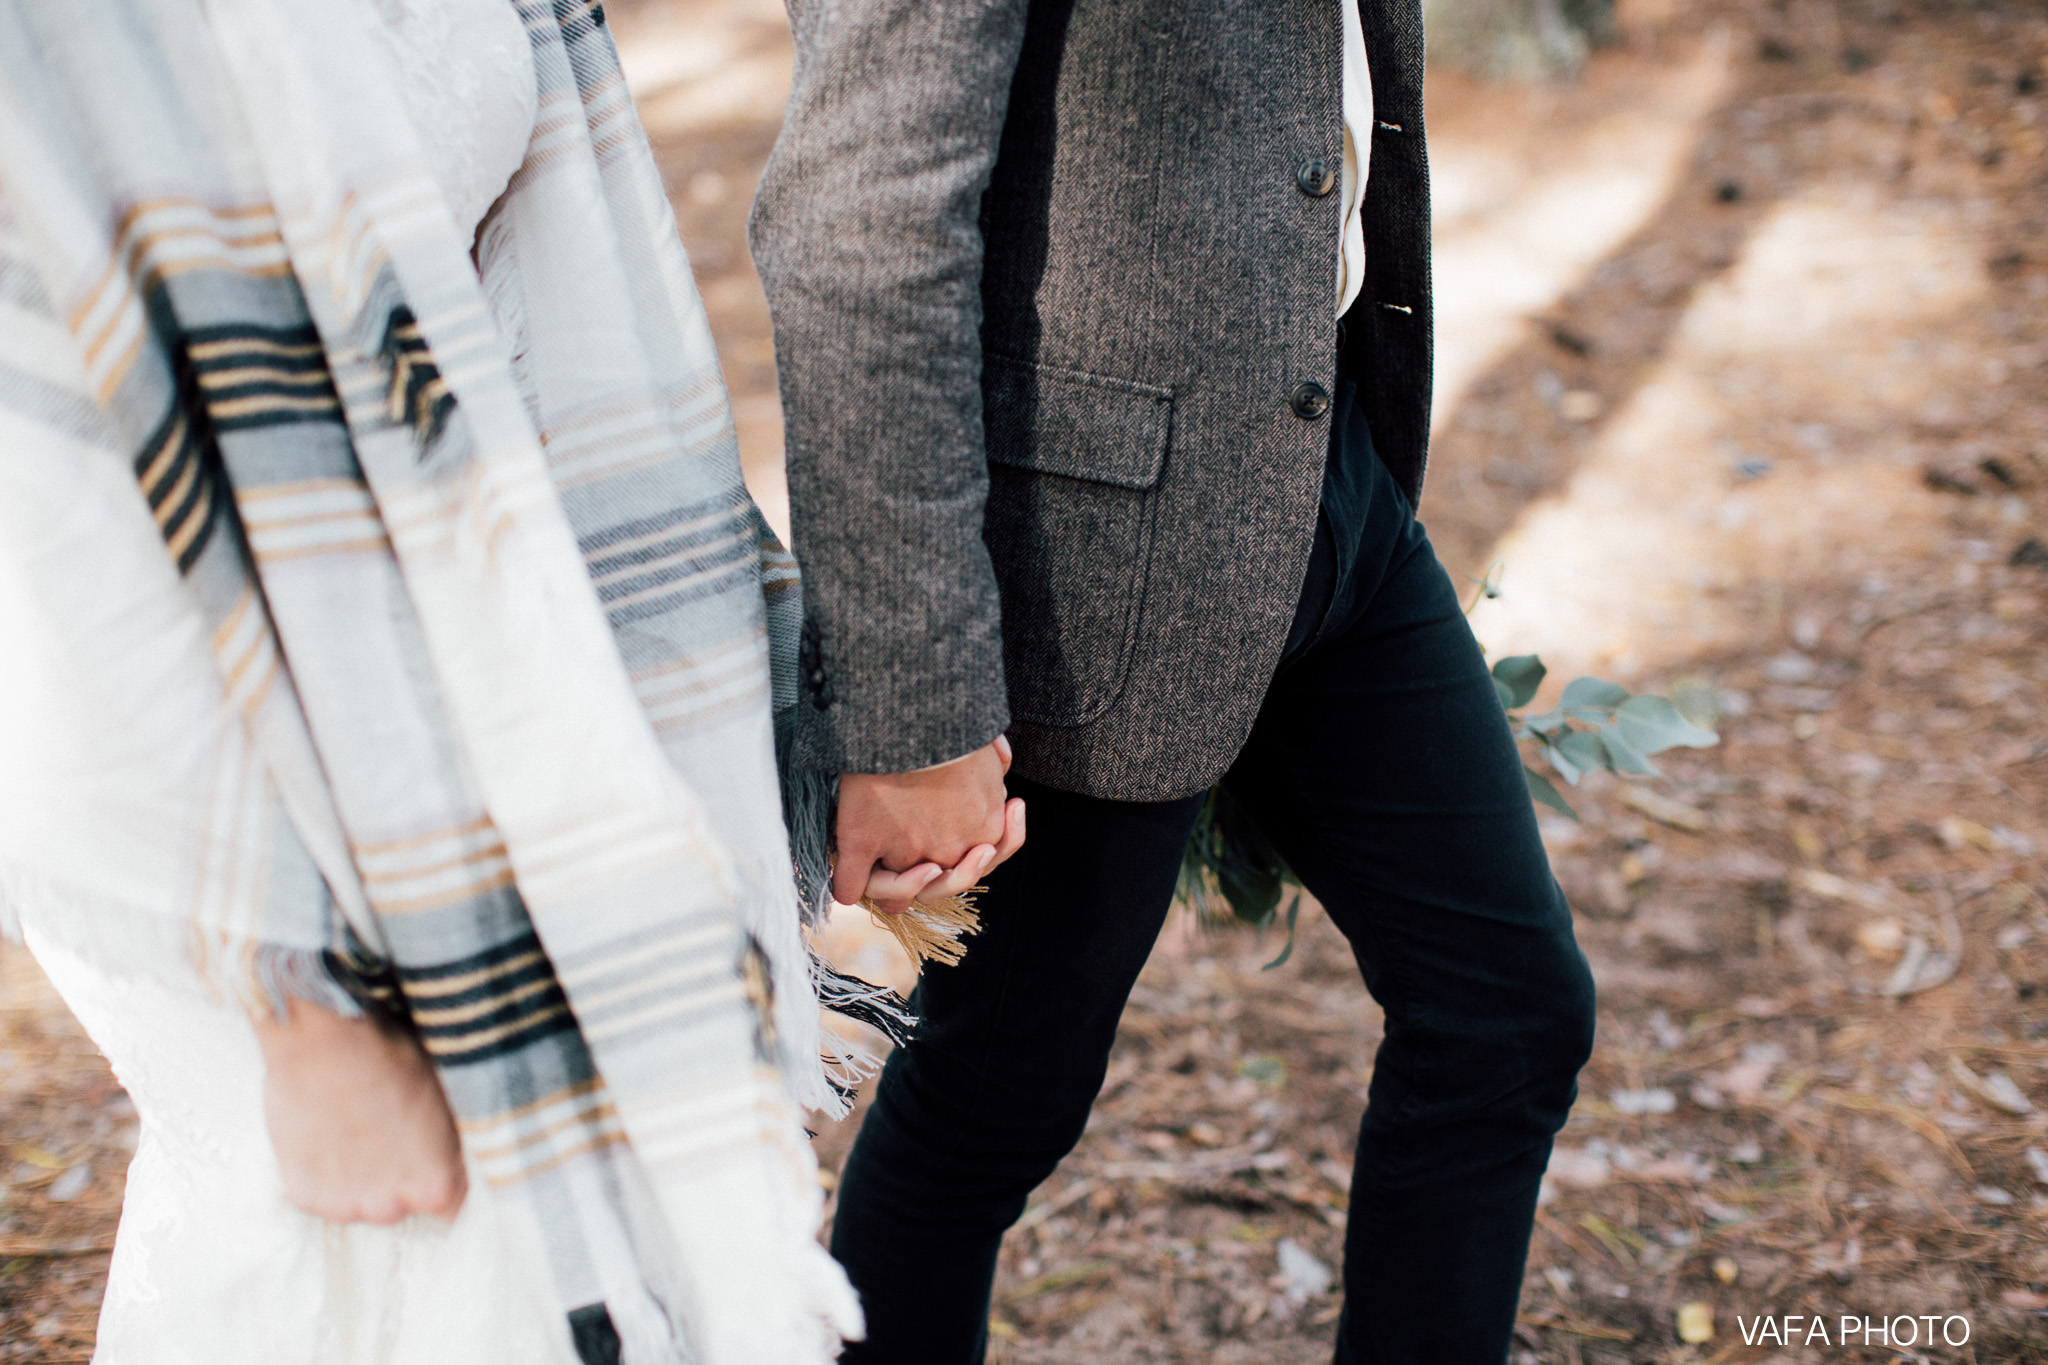 Hogback-Mountain-Wedding-Chelsea-Josh-Vafa-Photo-551.jpg